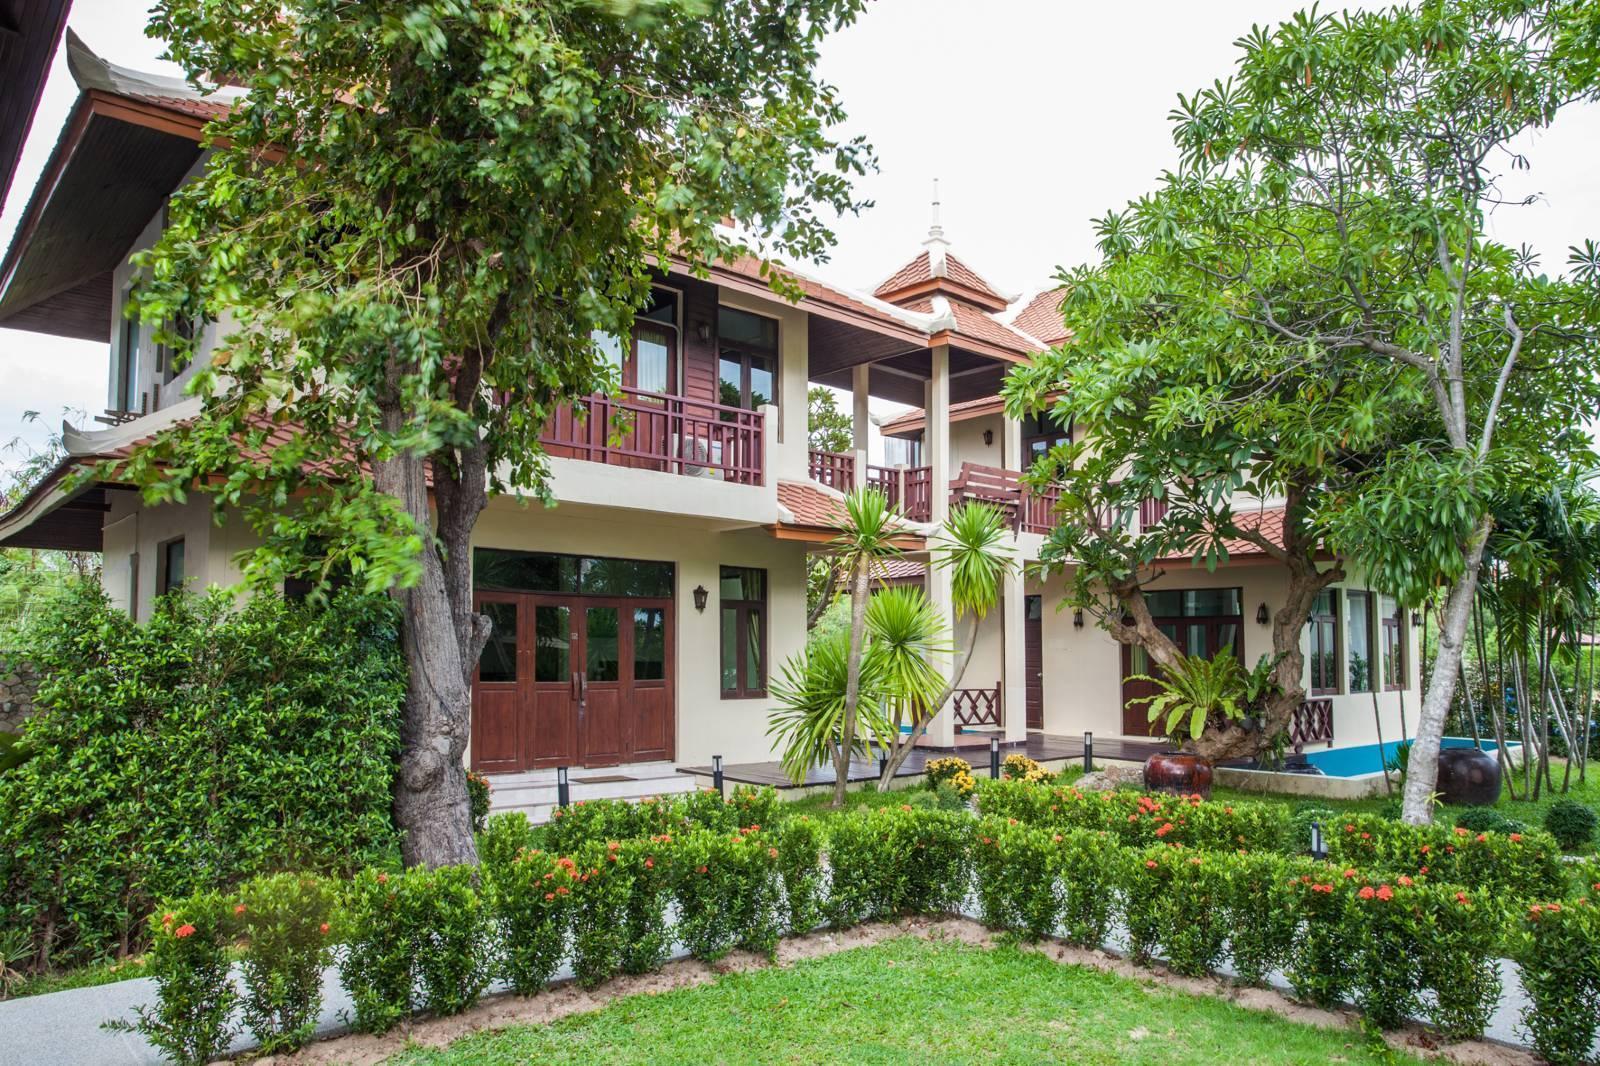 Jomtien Achawalai Holiday villa ( 5 room) วิลลา 5 ห้องนอน 3 ห้องน้ำส่วนตัว ขนาด 360 ตร.ม. – หาดจอมเทียน